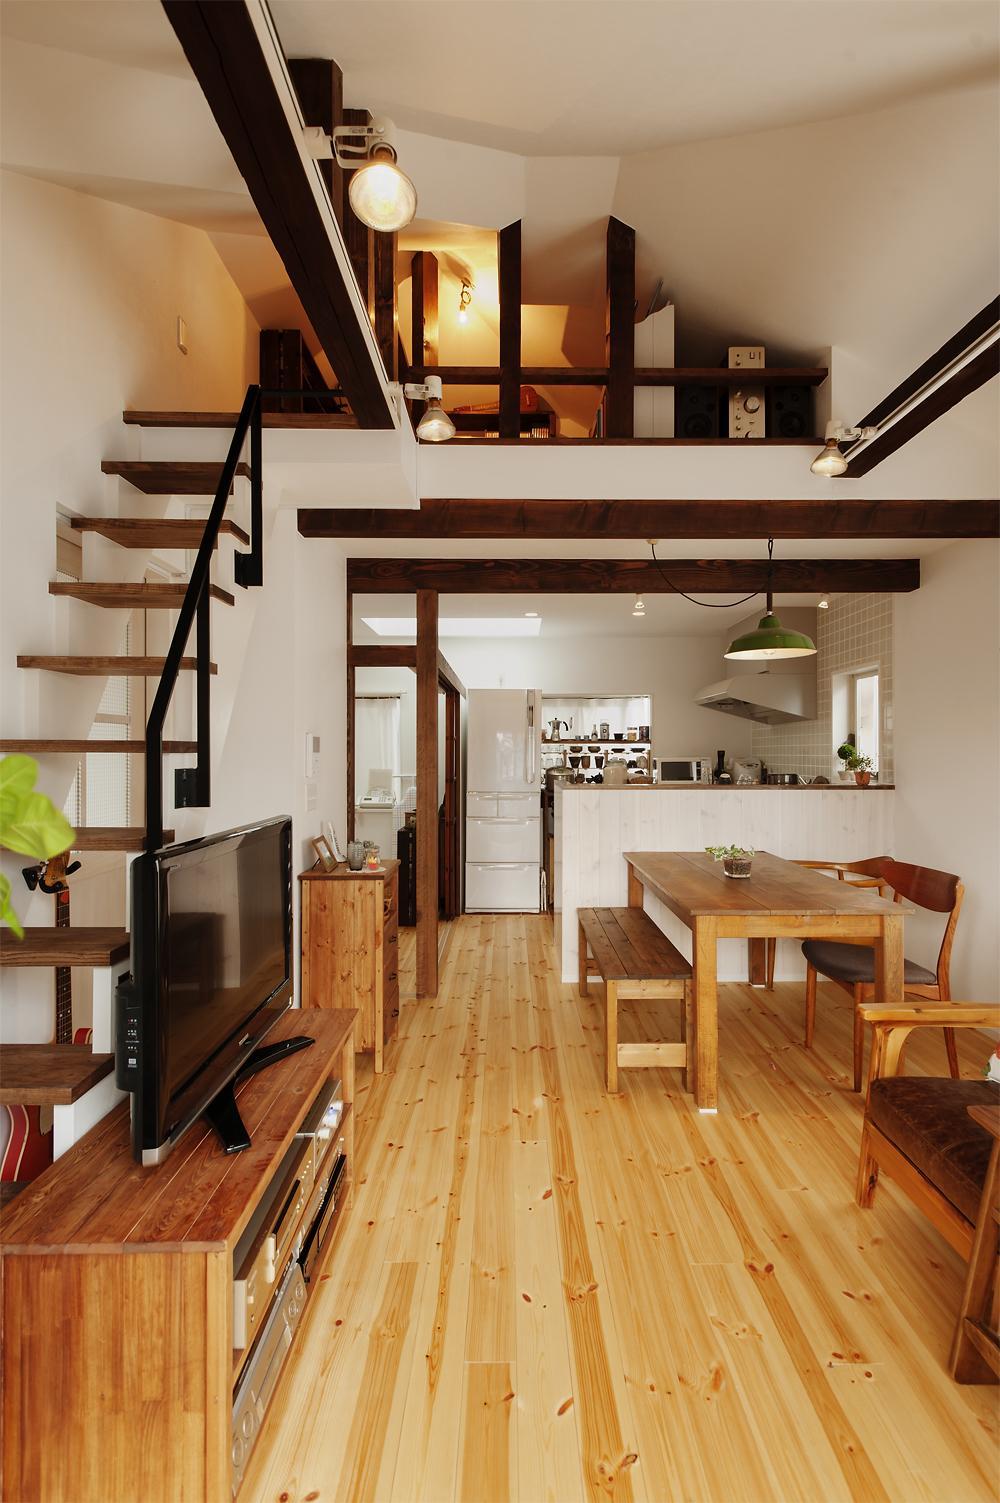 T邸・家族のくらしをより楽しく豊かにするとっておきの家の部屋 ロフト付きの開放的なLDK